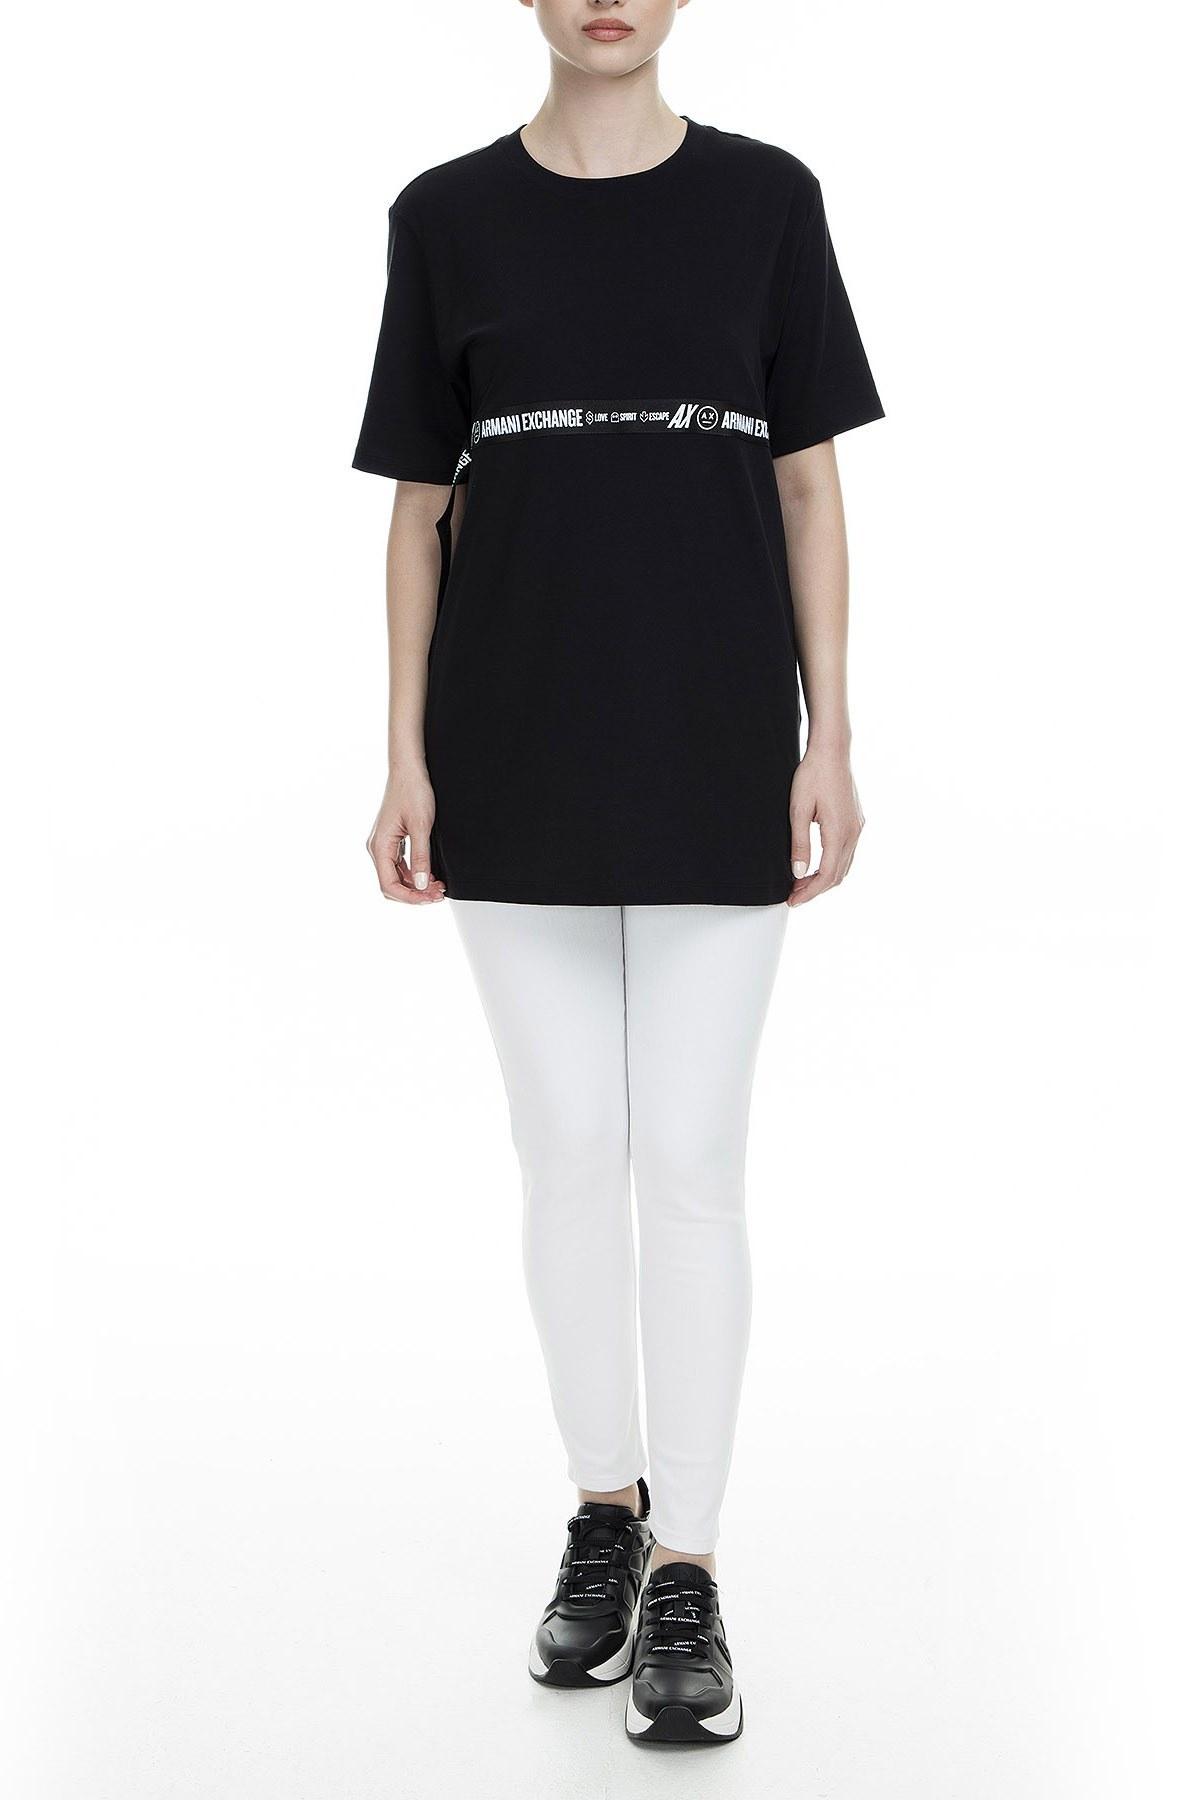 Armani Exchange Bayan T Shirt S 6GYTED YJX9Z 1200 SİYAH